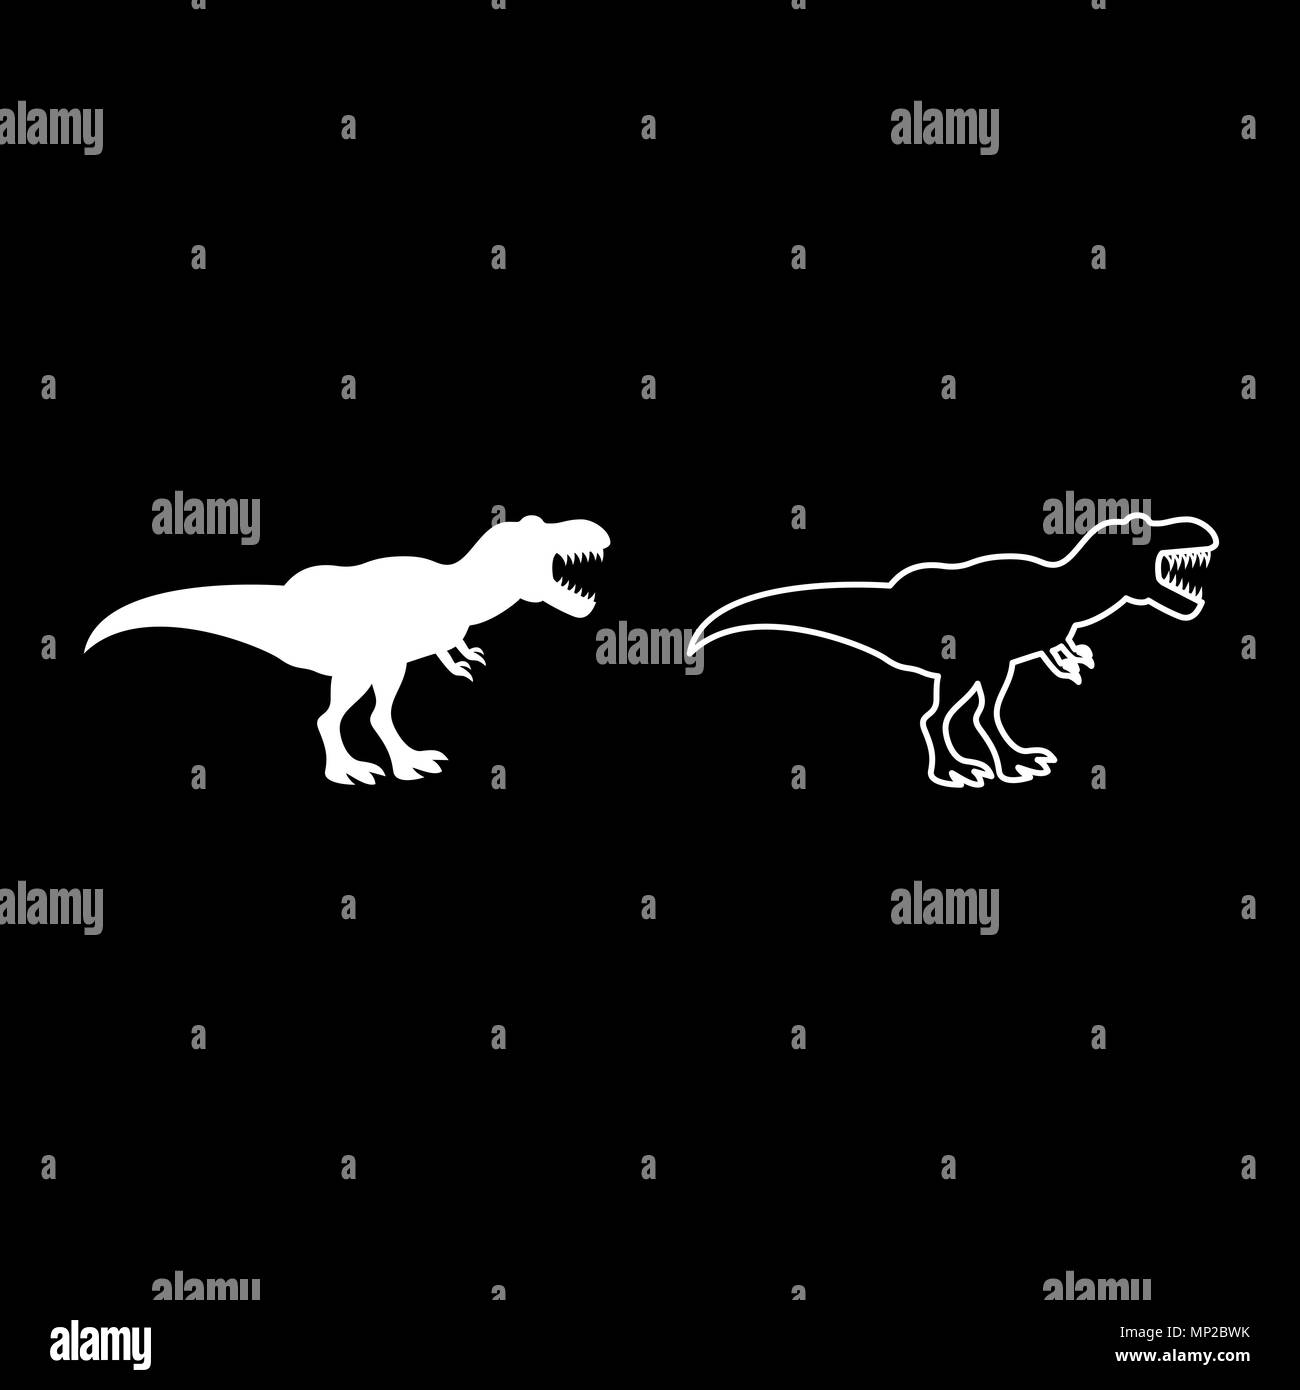 Dinosaur tyrannosaurus t rex icon set white color vector illustration flat style simple image outline - Stock Image